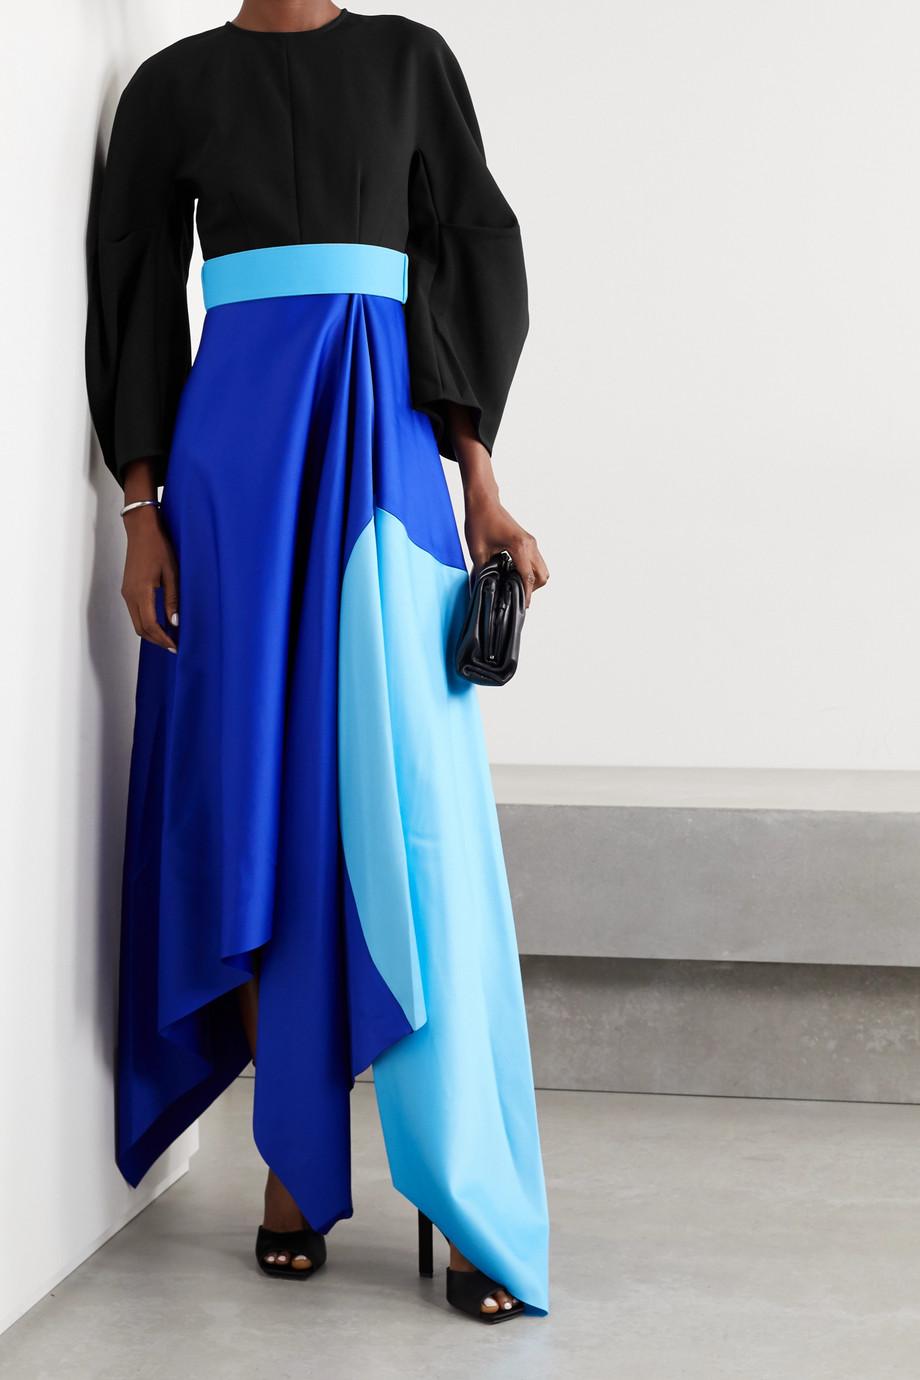 Solace London Quinn asymmetrische Robe aus Crêpe und Duchesse-Satin in Colour-Block-Optik